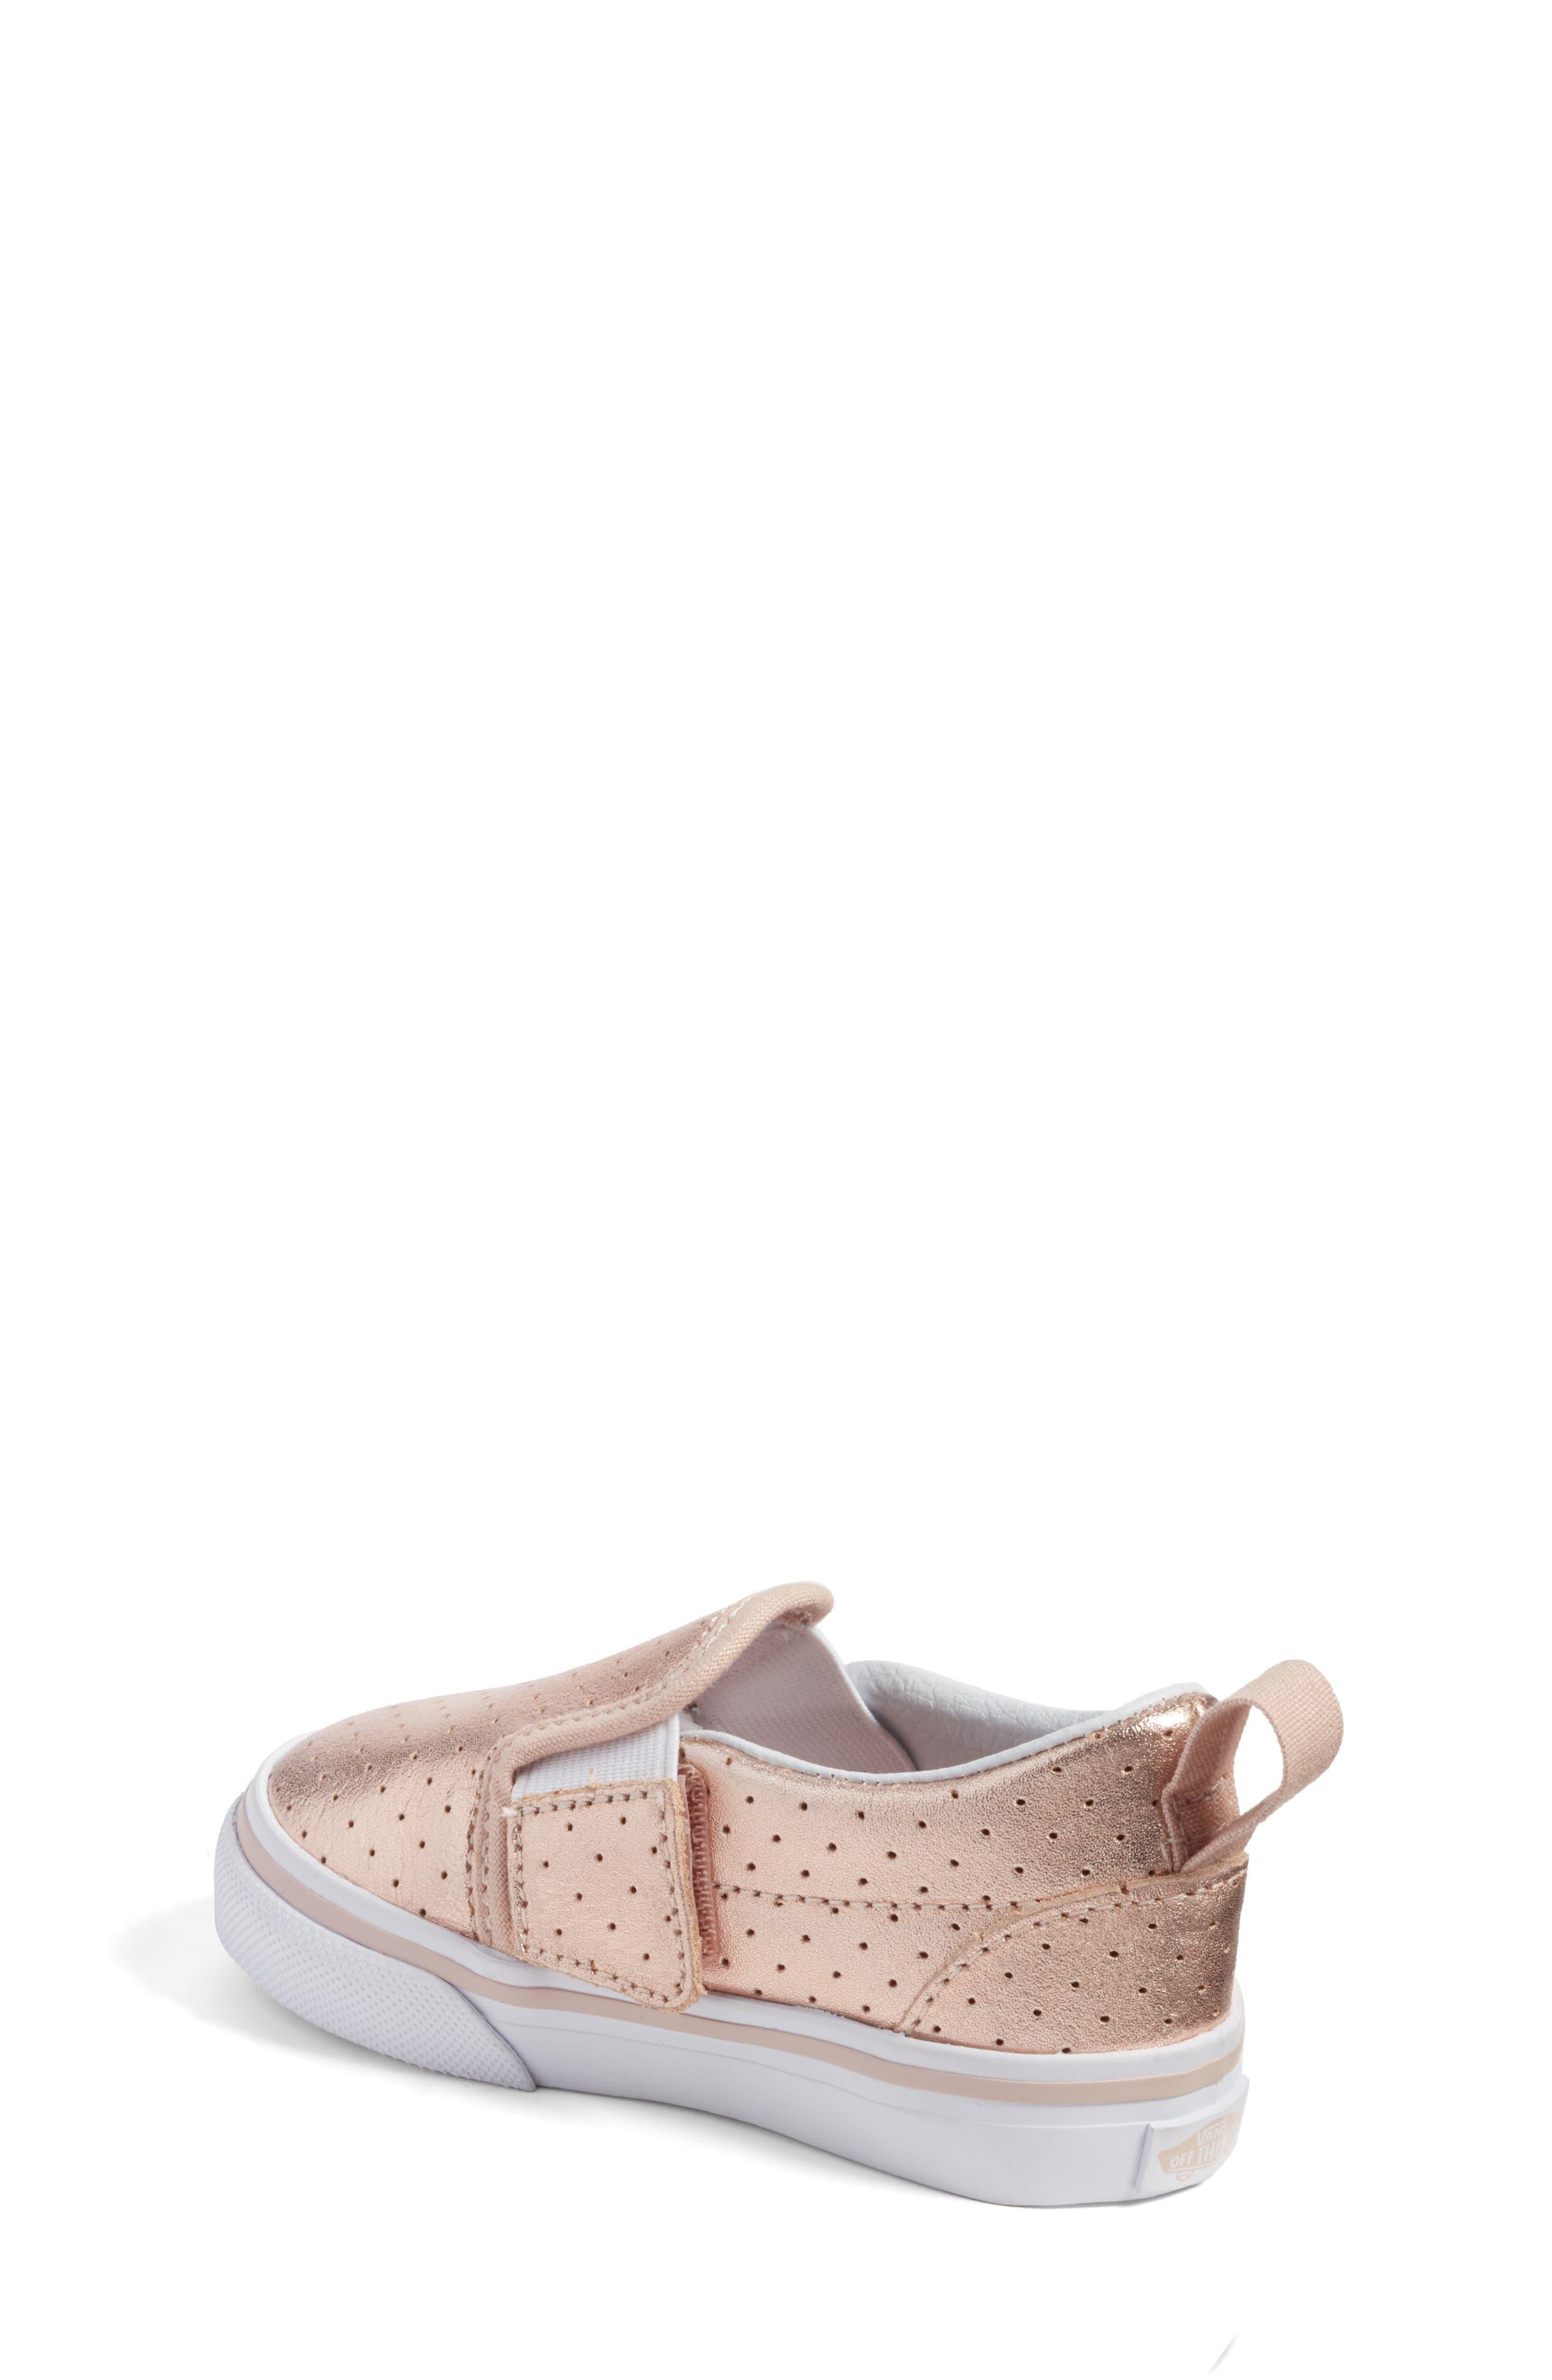 'Classic' Slip-On Sneaker,                             Alternate thumbnail 2, color,                             Rose Gold Perf Leather